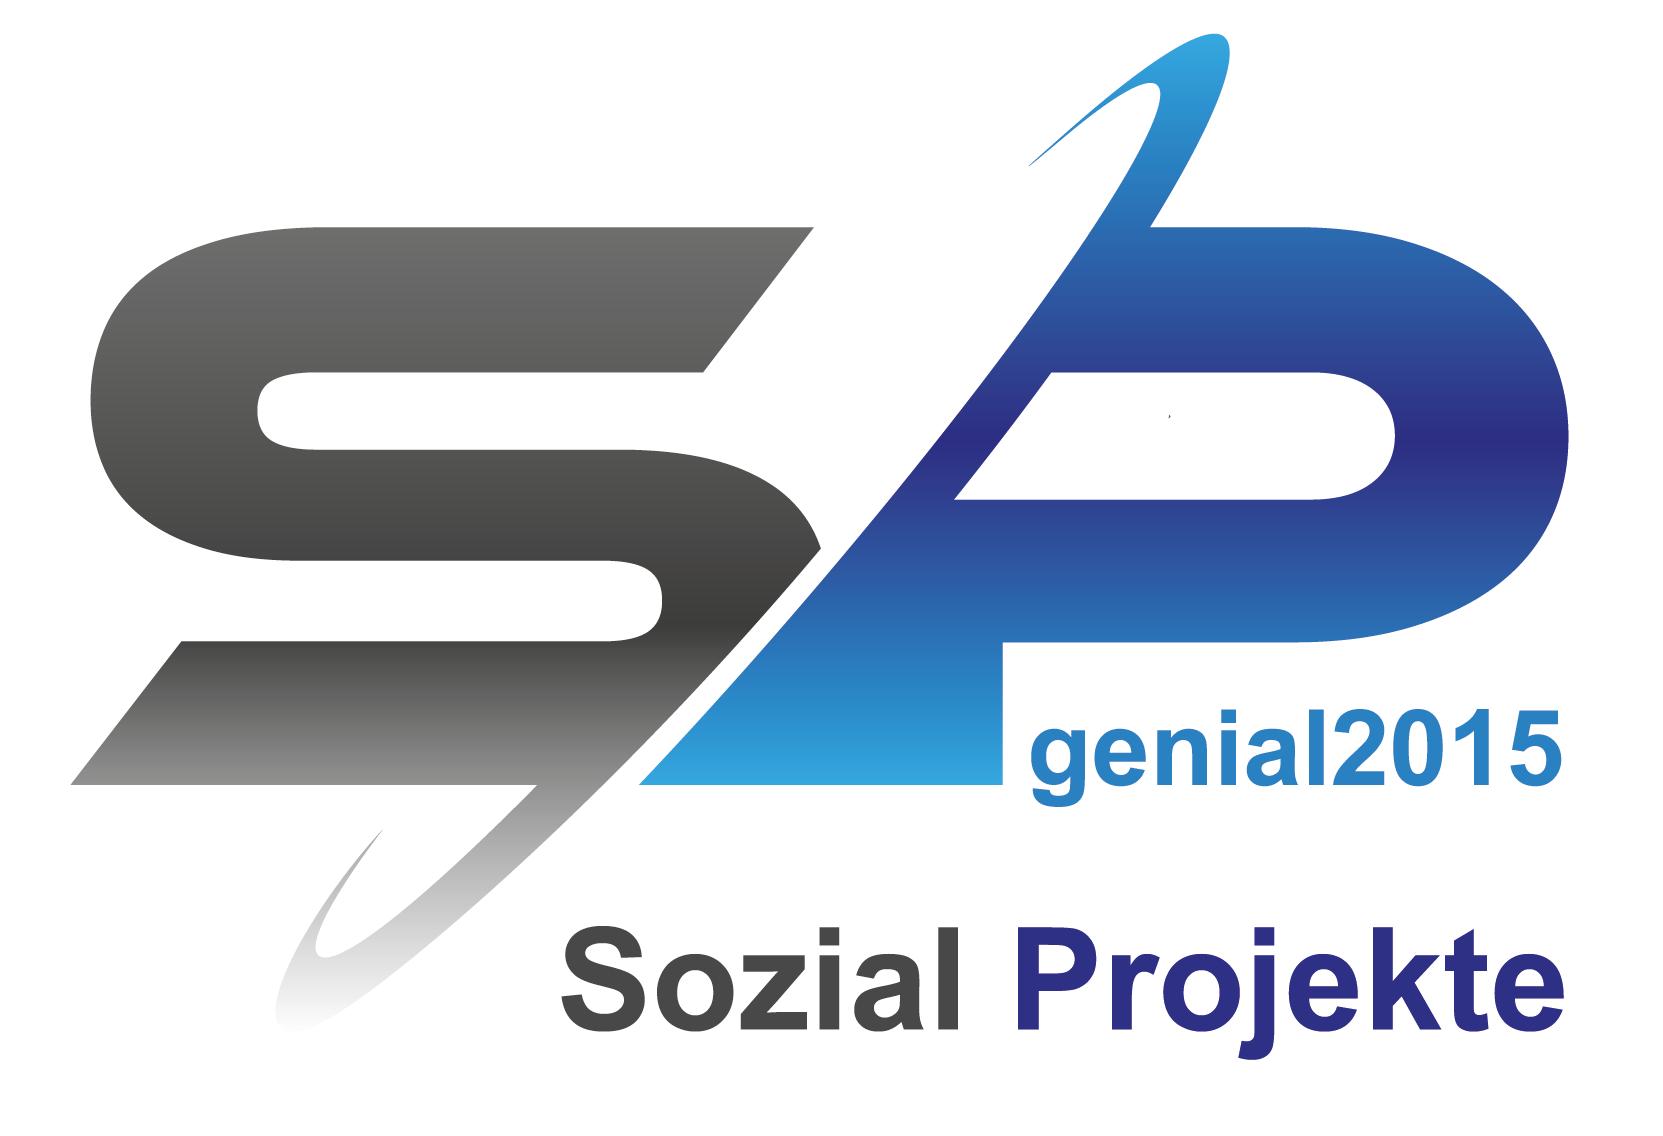 1533489654_Logo-Sozialprojekte.png